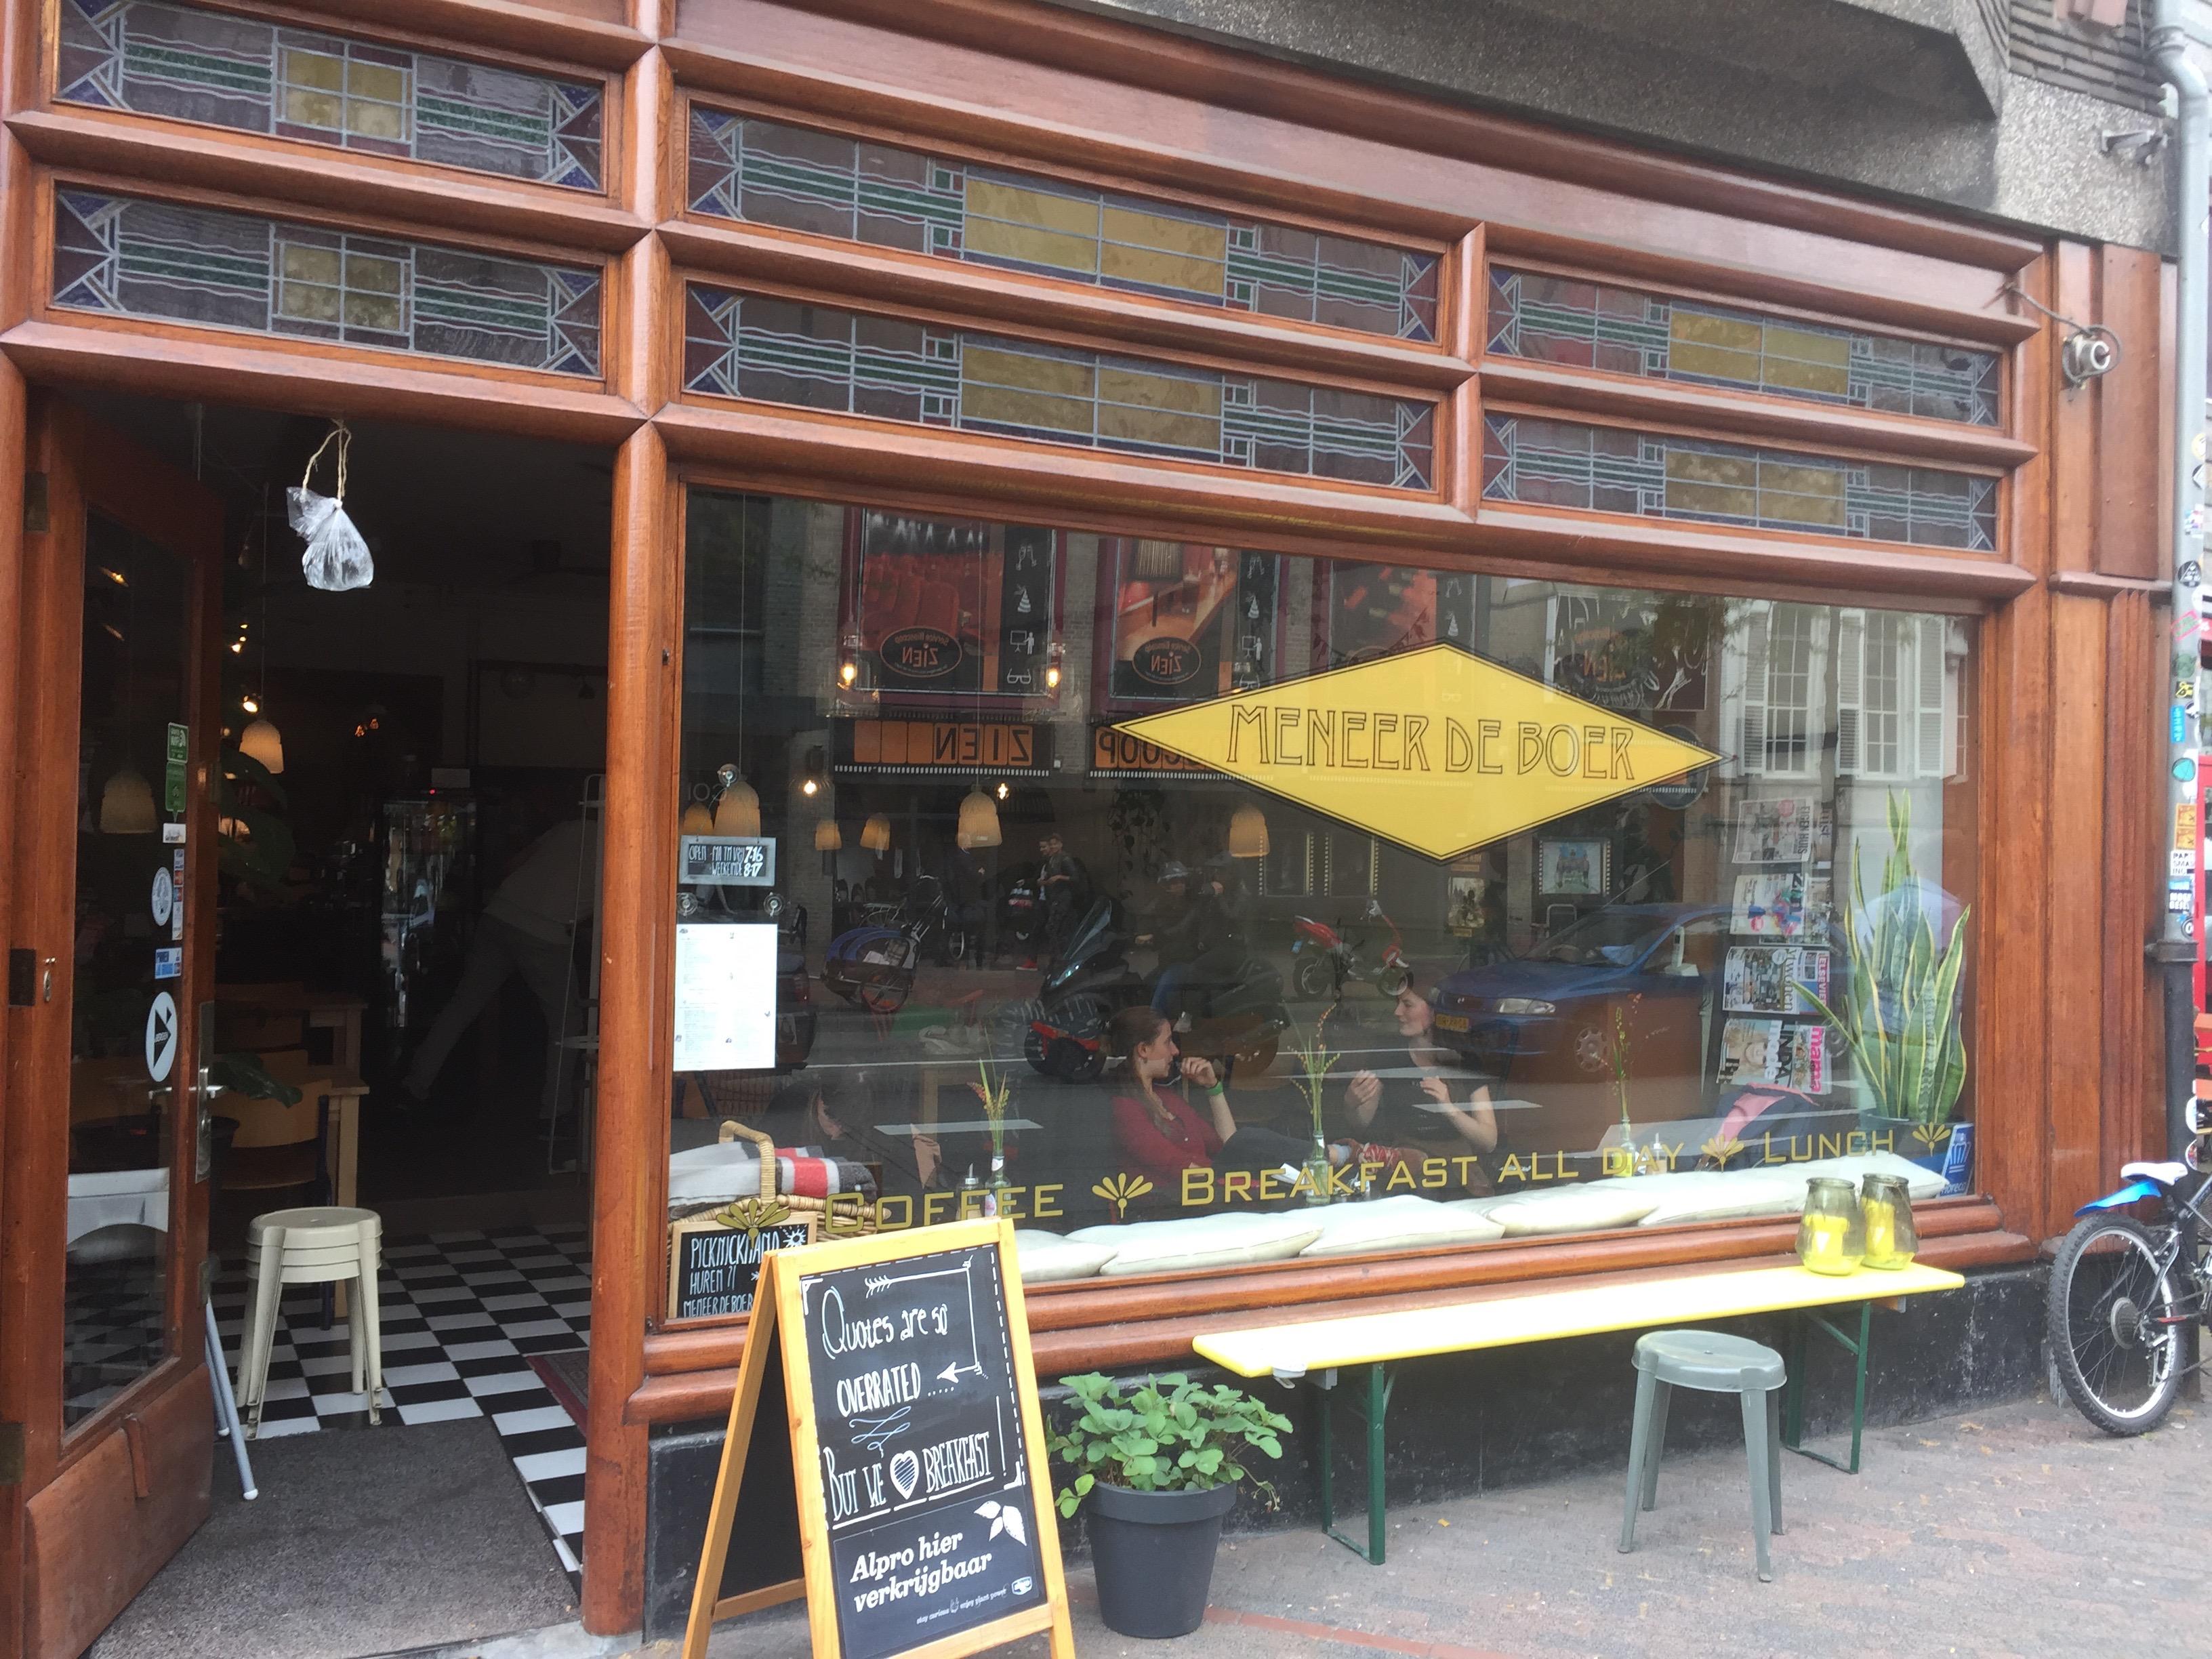 Tulp Keukens Amersfoort : Eigenhuis keukens amersfoort review leicht